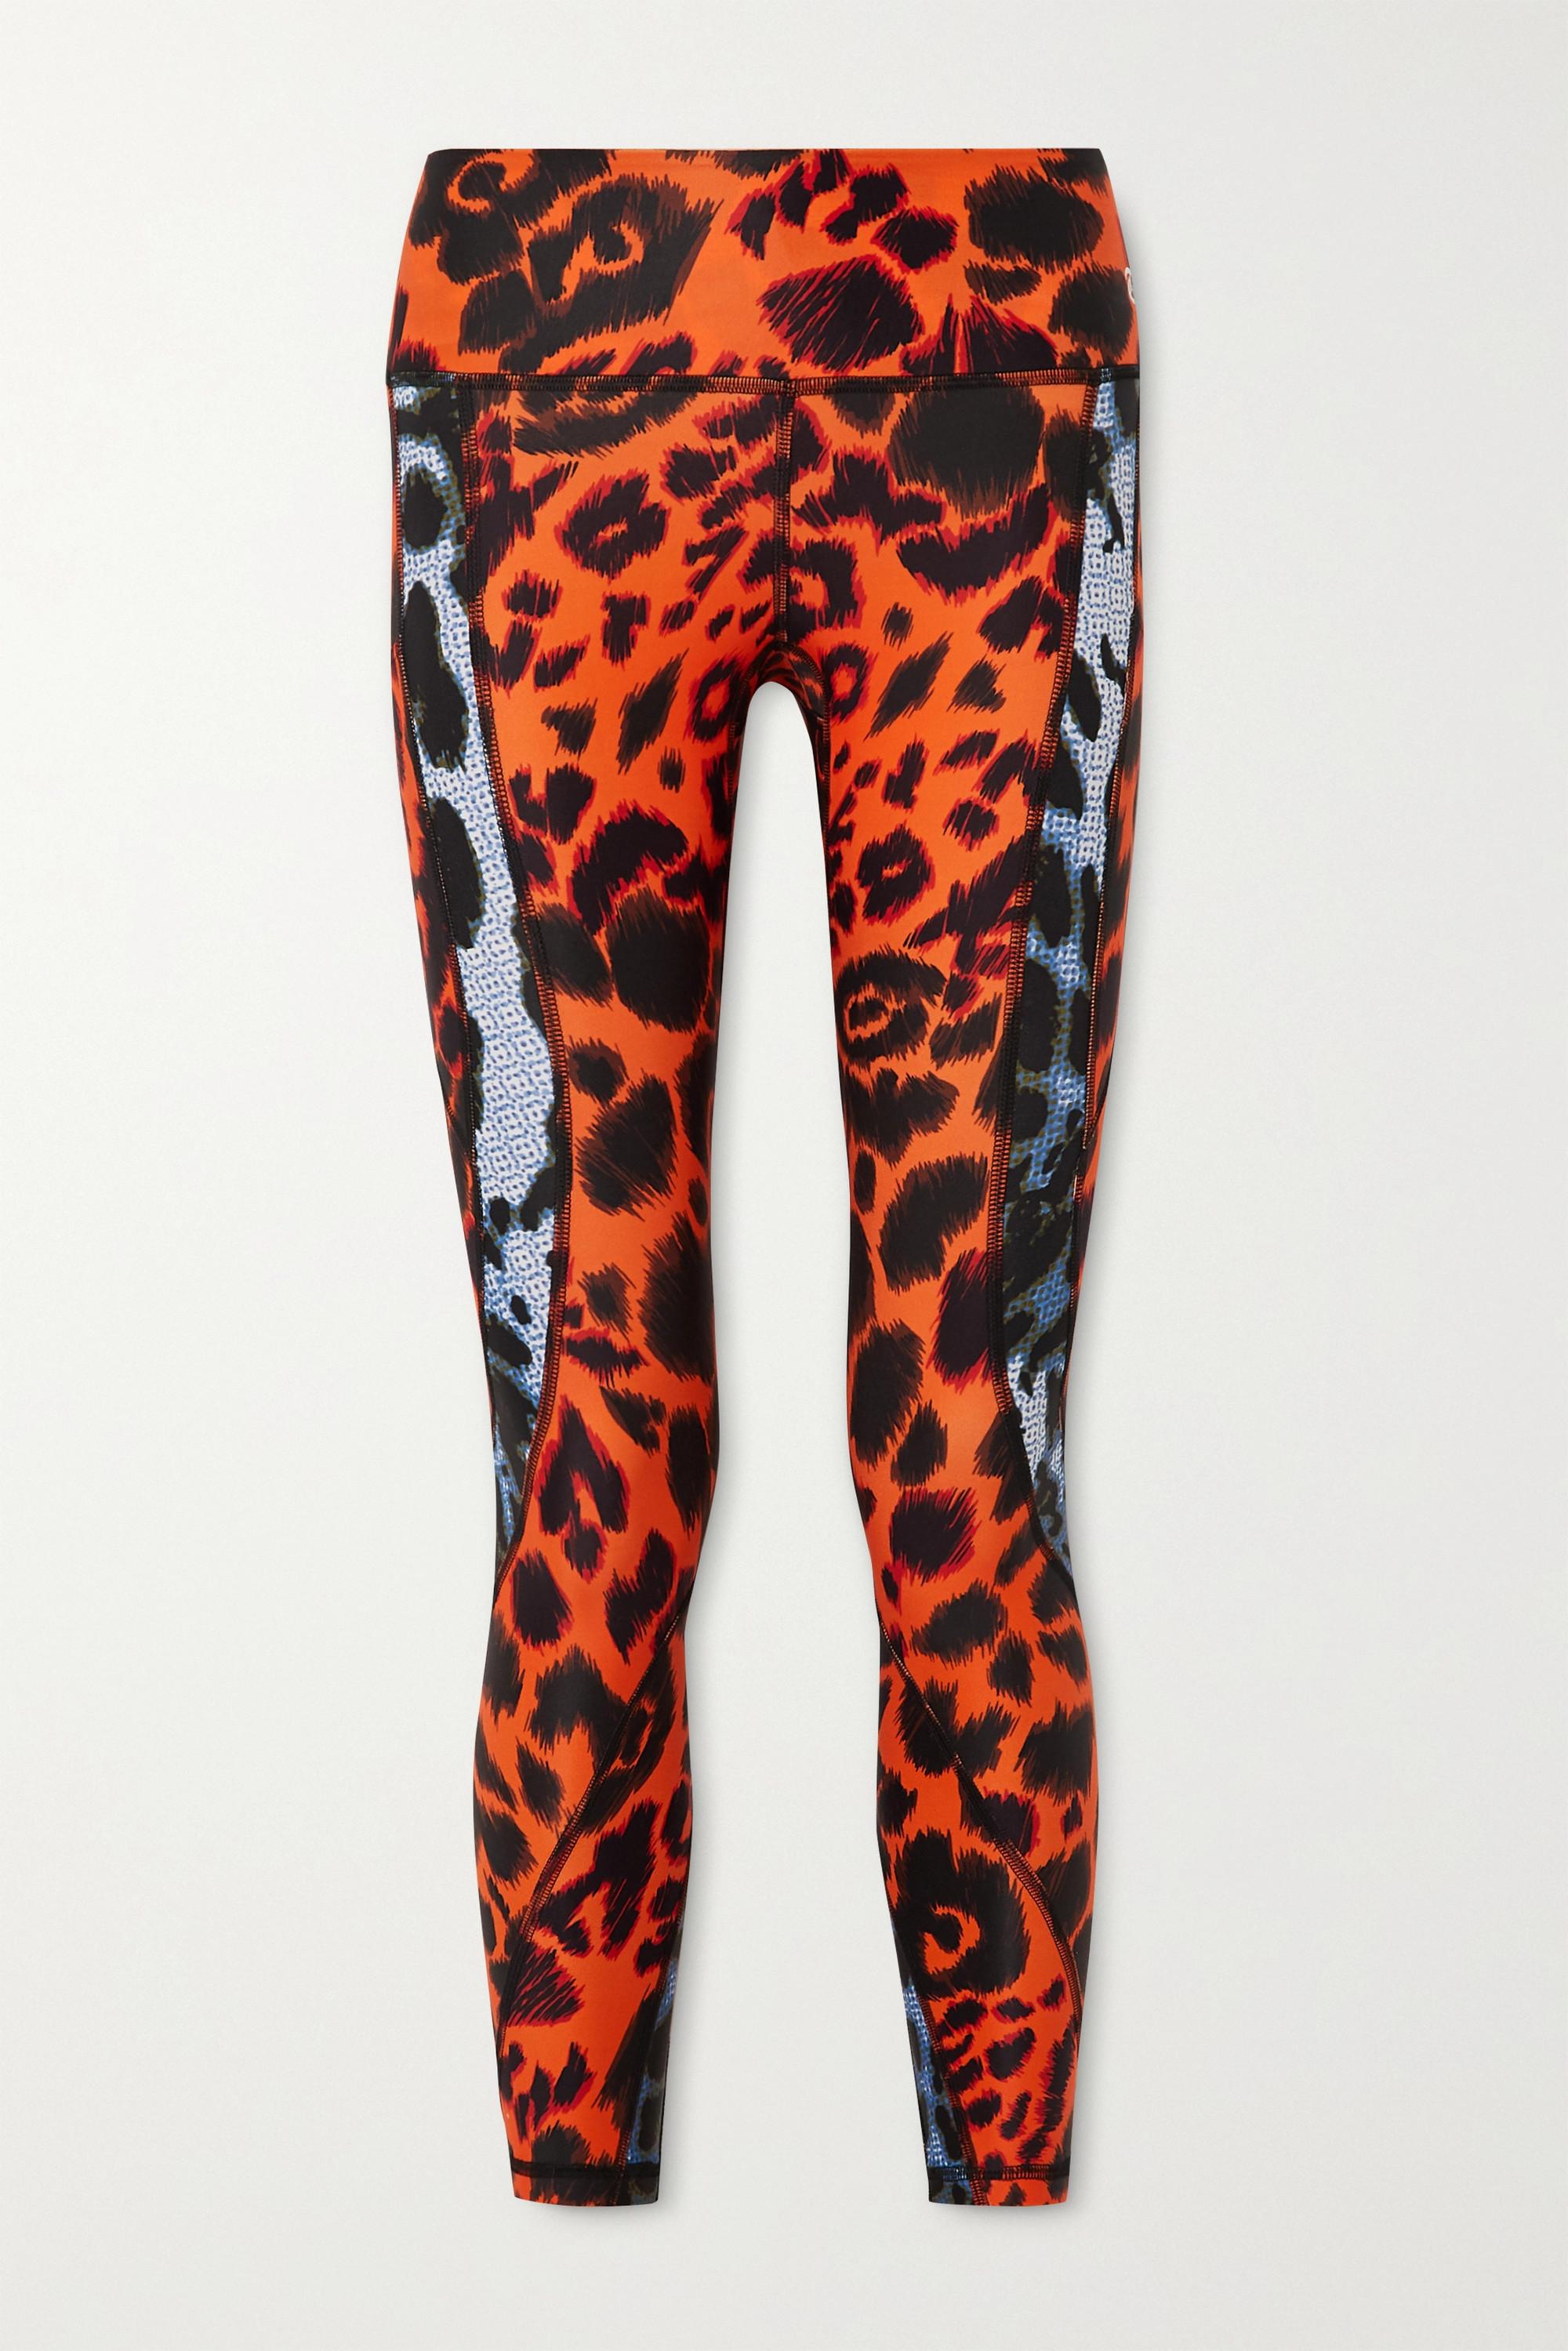 Twin Fantasy Paneled leopard-print stretch leggings